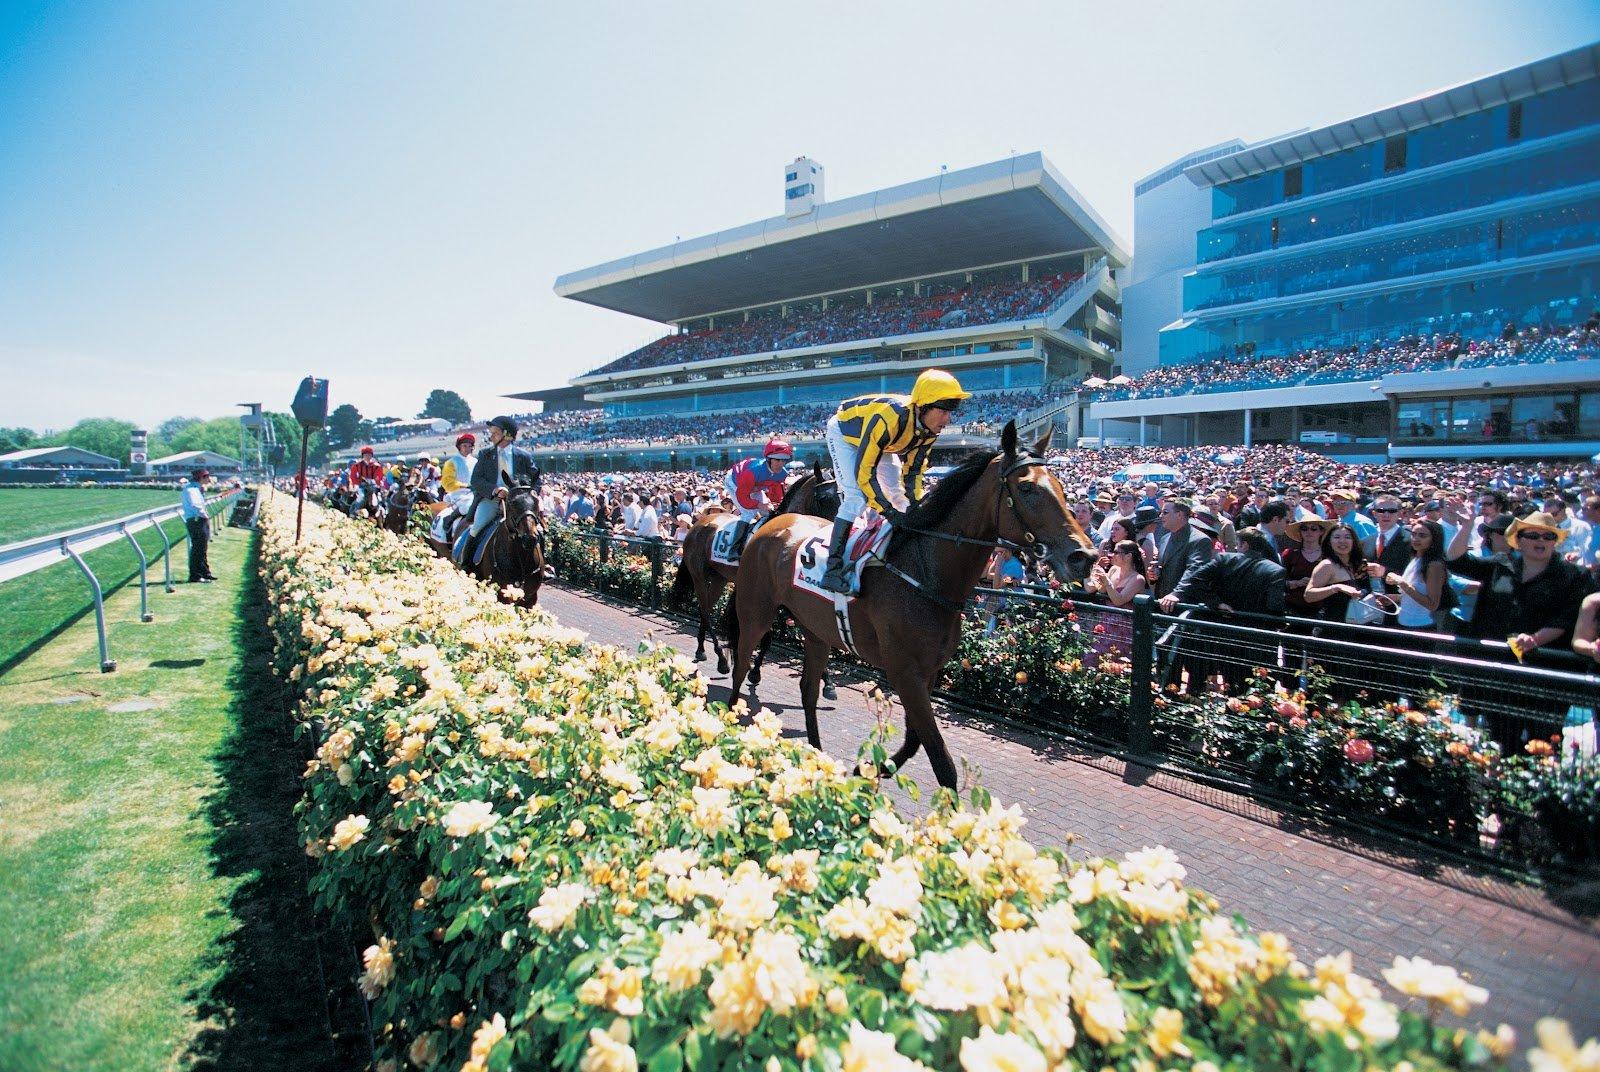 Australia's premier racing track is Flemington